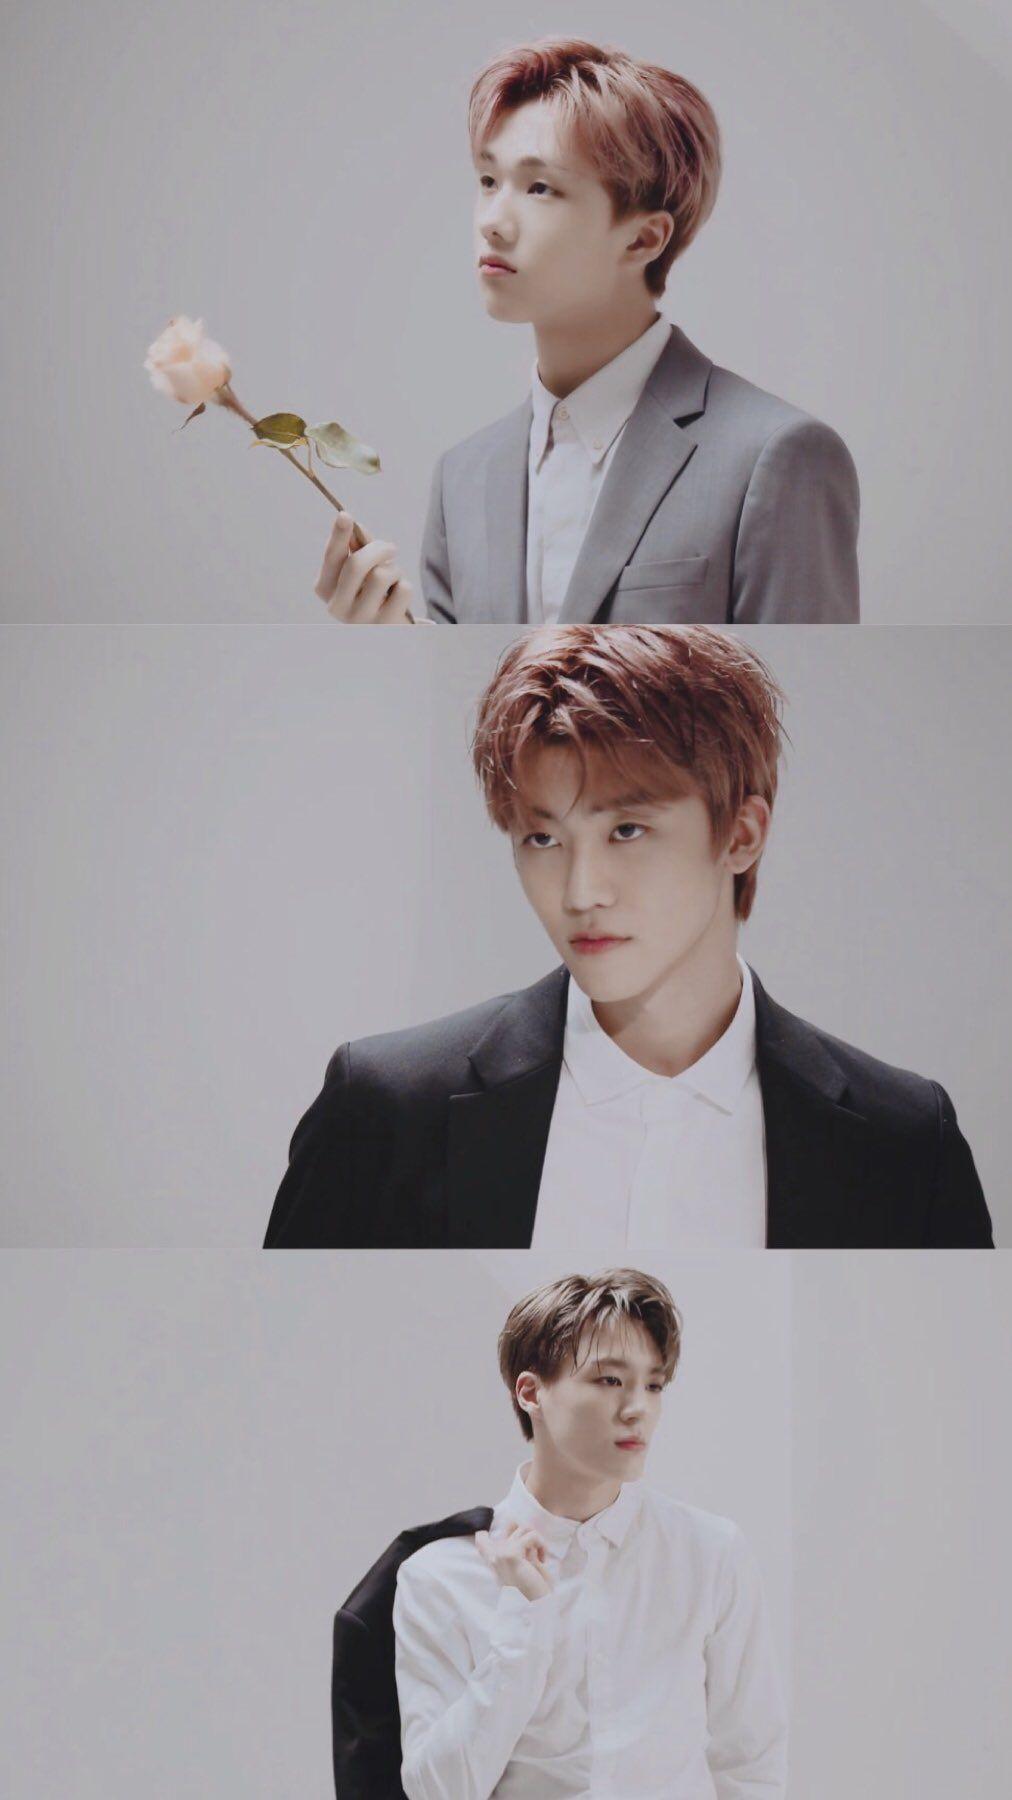 Wallpaper Lockscreen Nct Dream Season Greeting 2020 Nctdream Jeno Jaemin Jisung Nct Dream Nct Dream Jaemin Jeno Nct